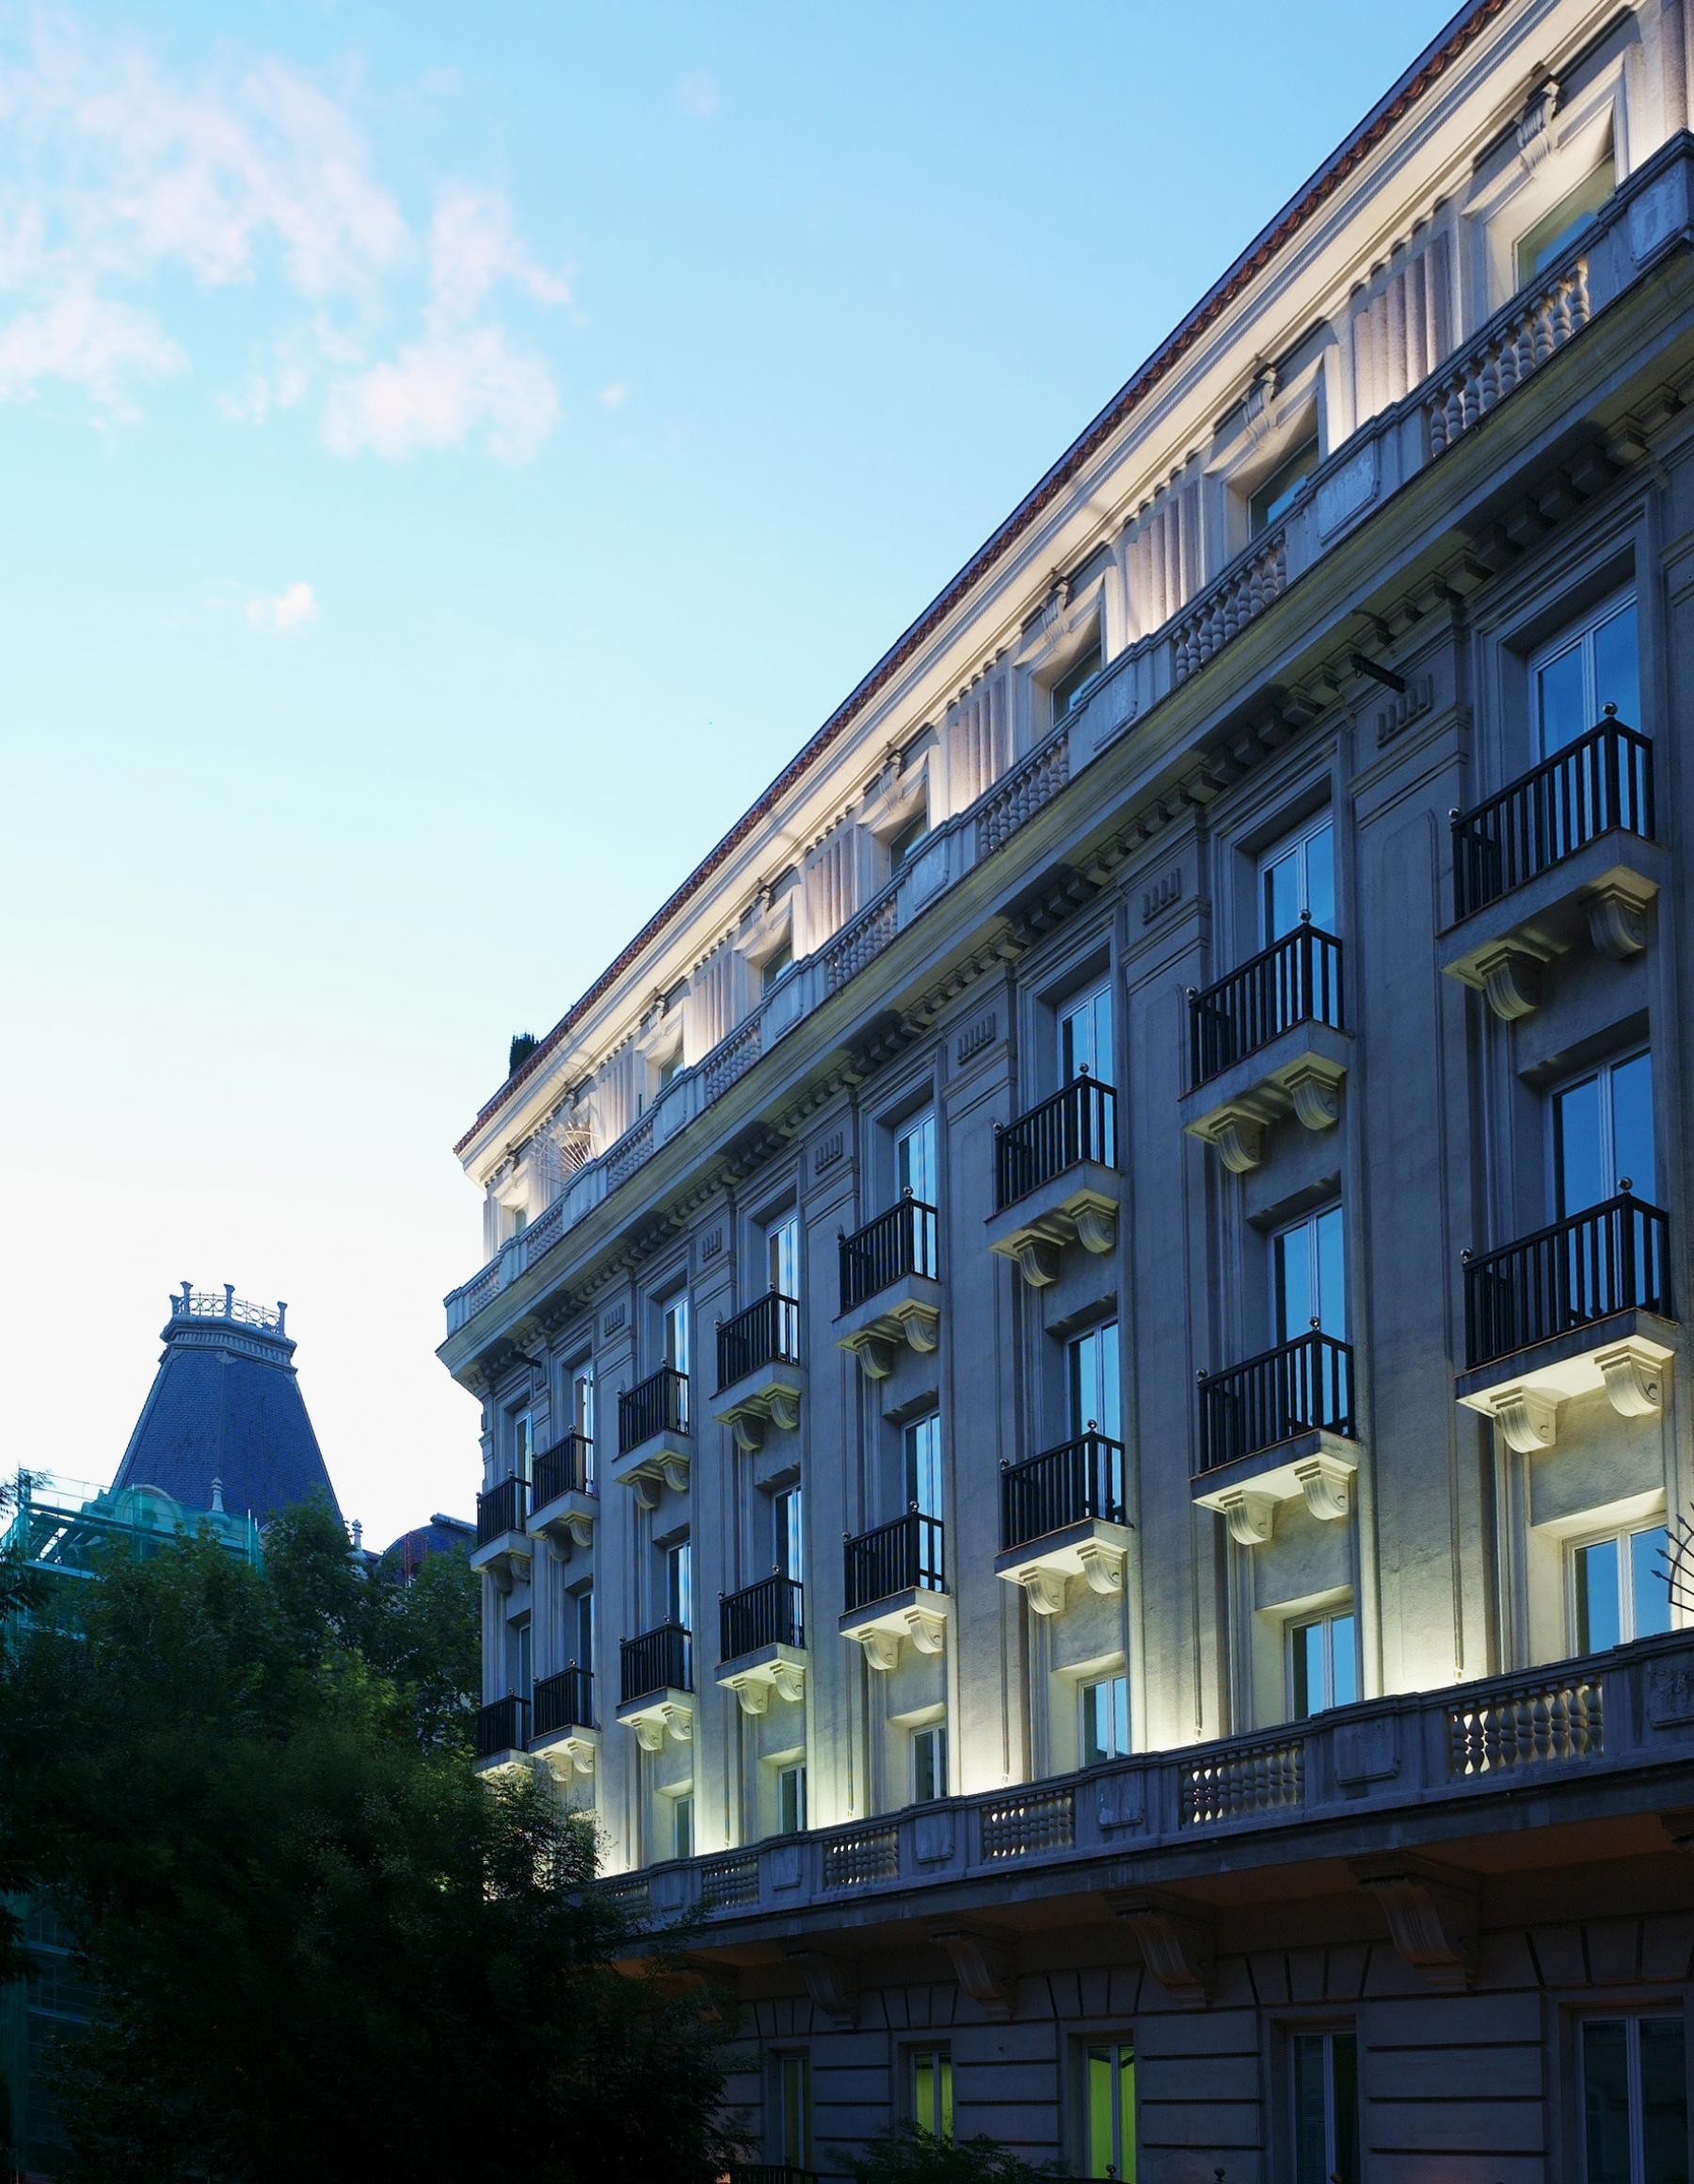 Alquilar oficinas Calle de Hermosilla 11, Madrid (5)